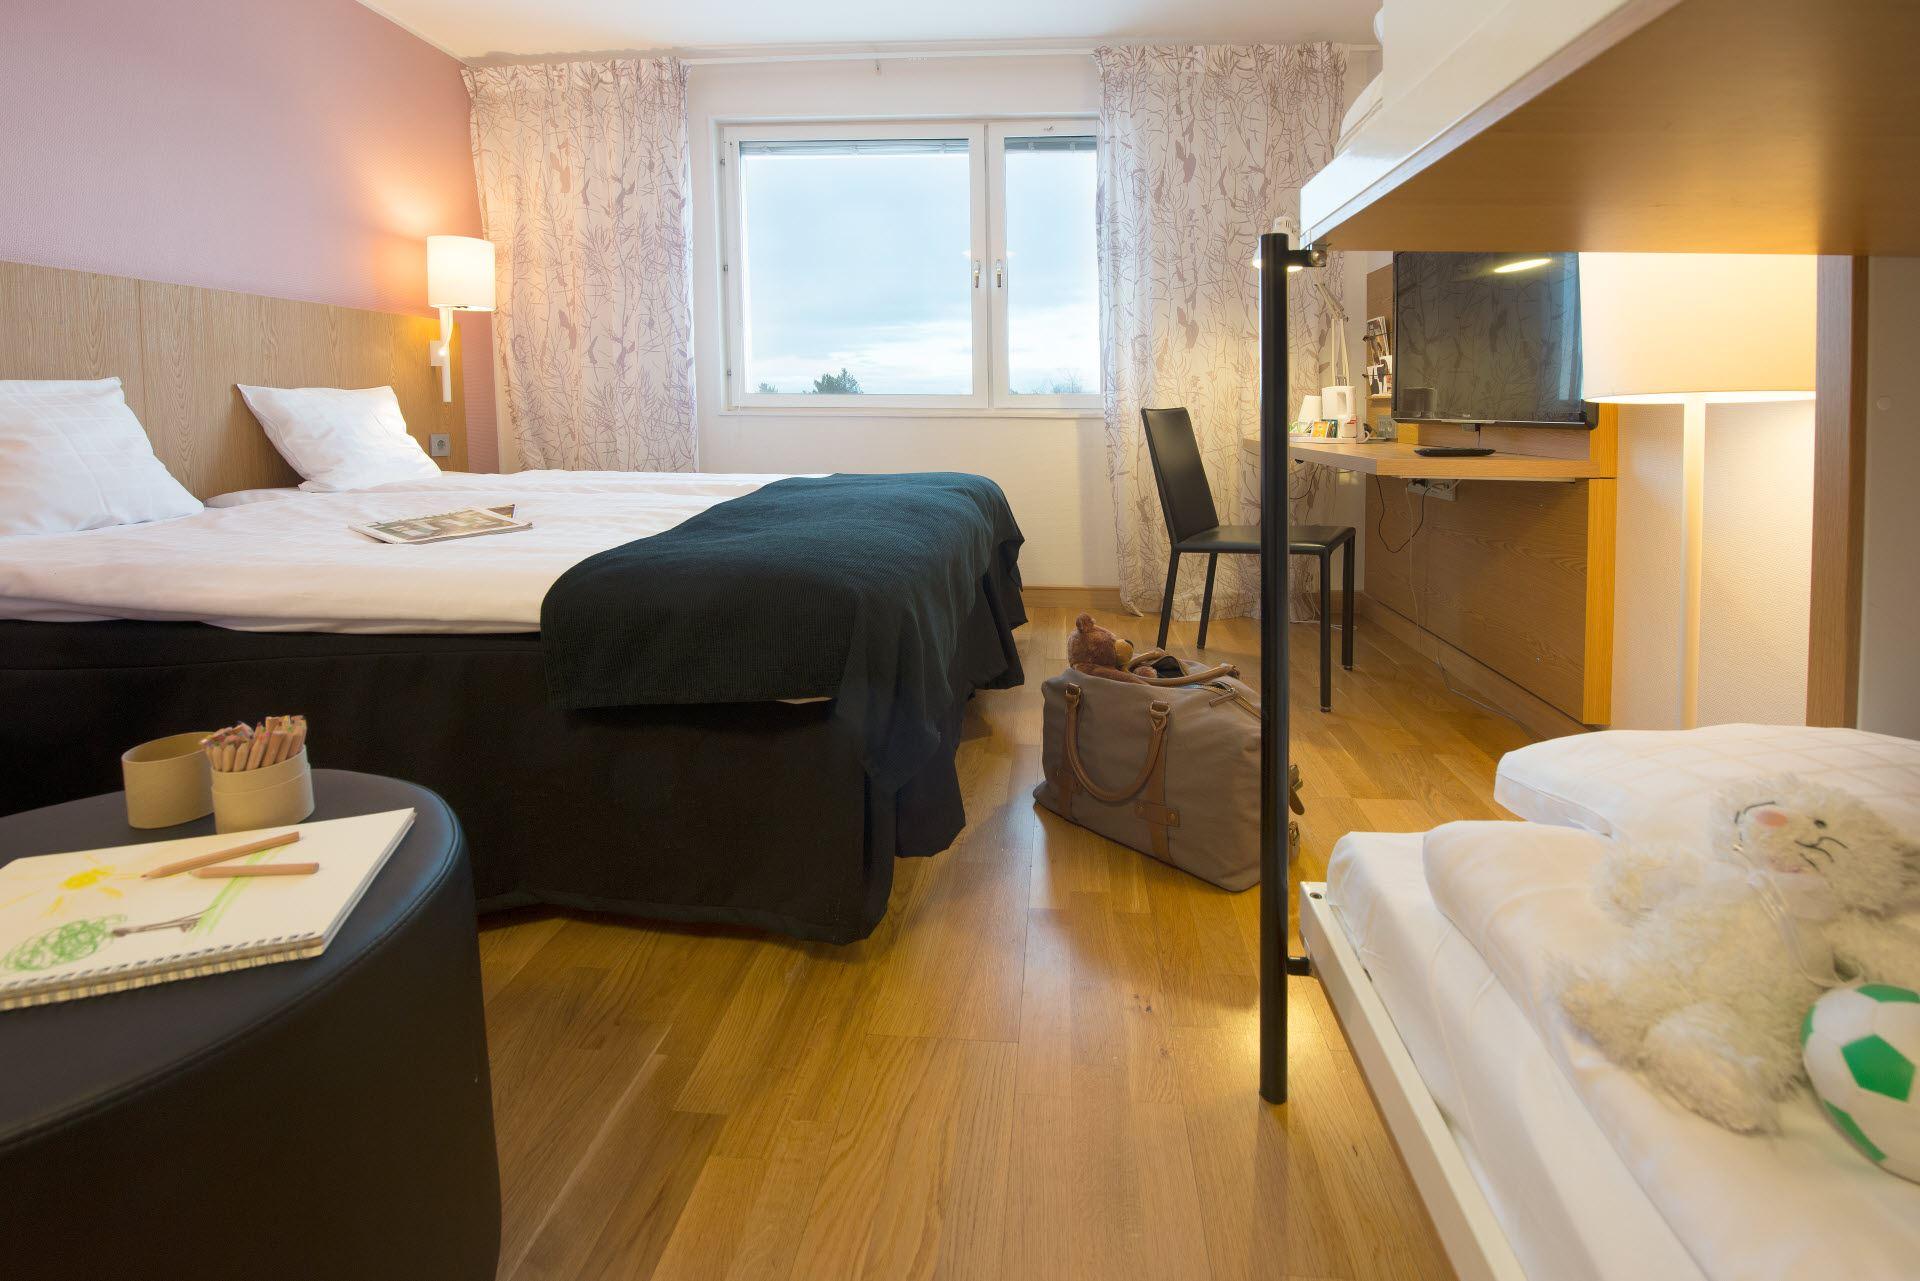 Scandic hotell Bollnäs